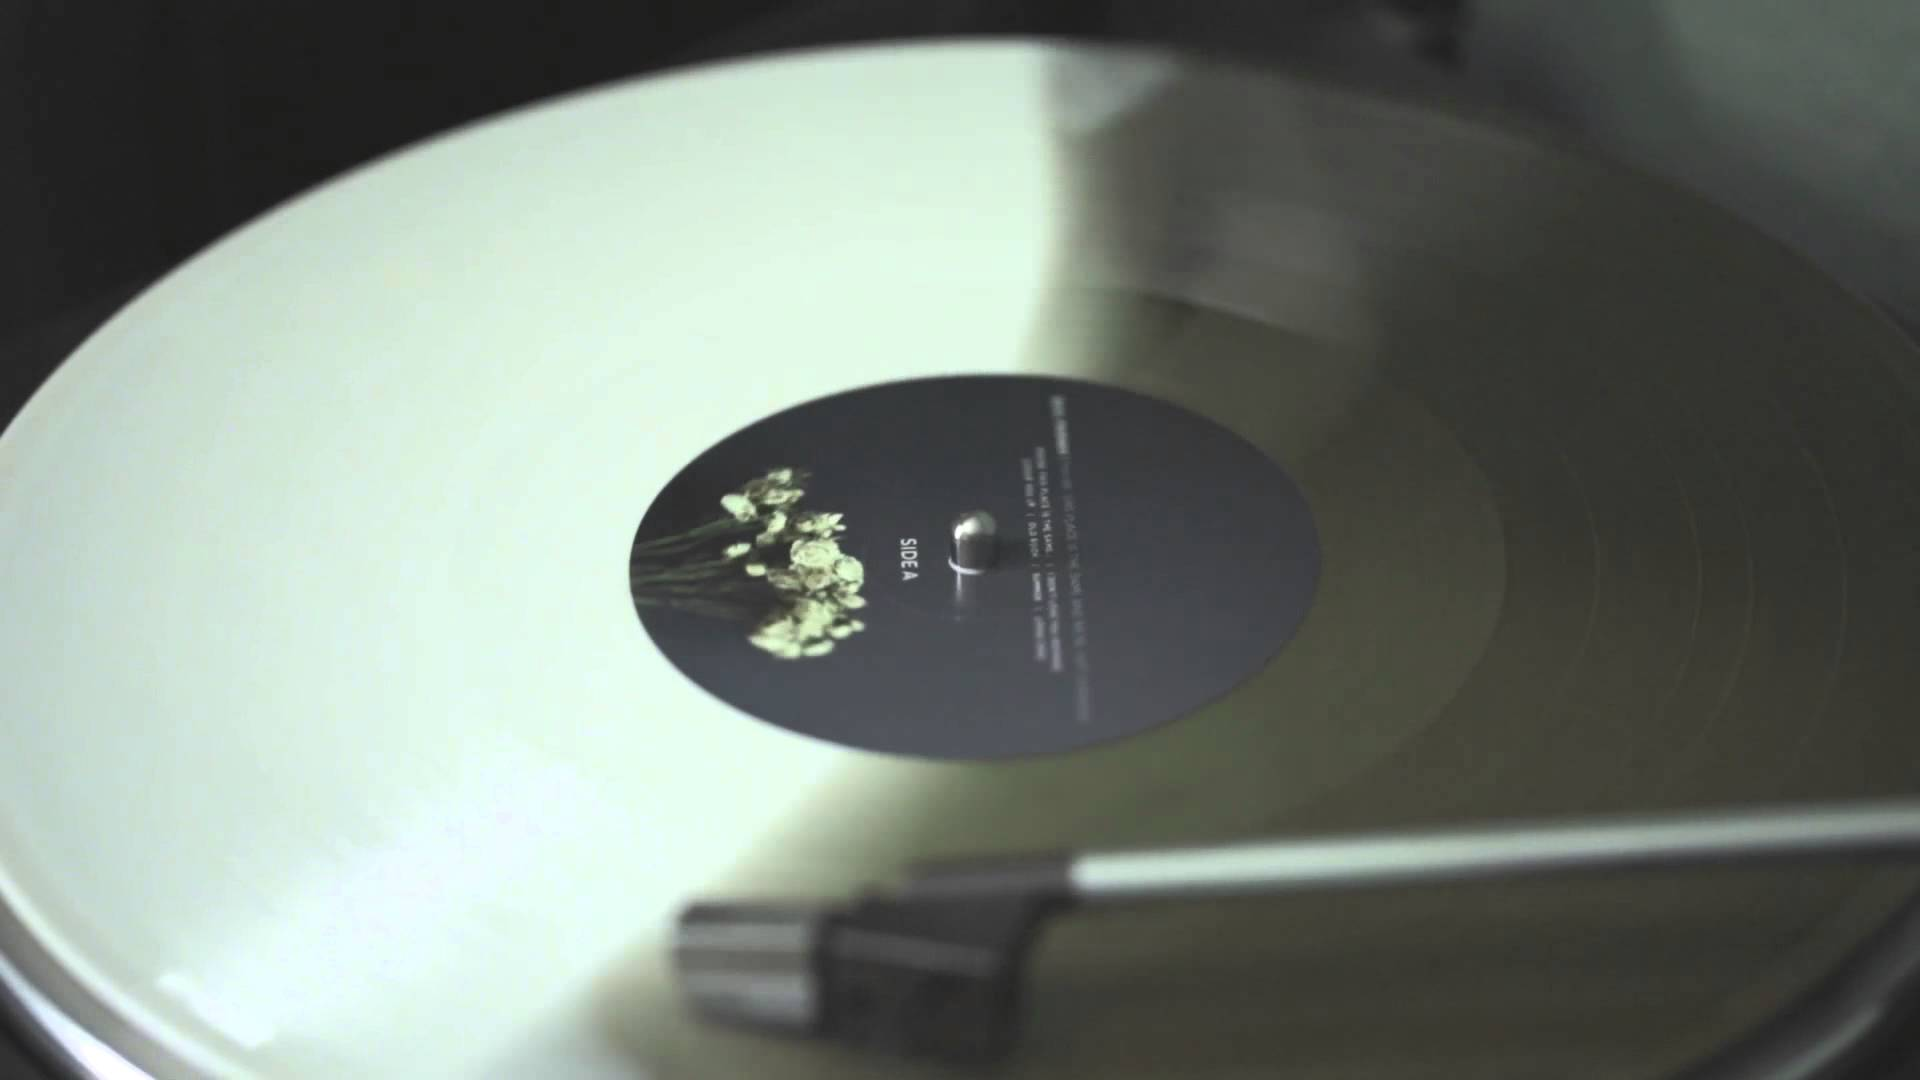 Real Friends - Old Book (Album Stream)